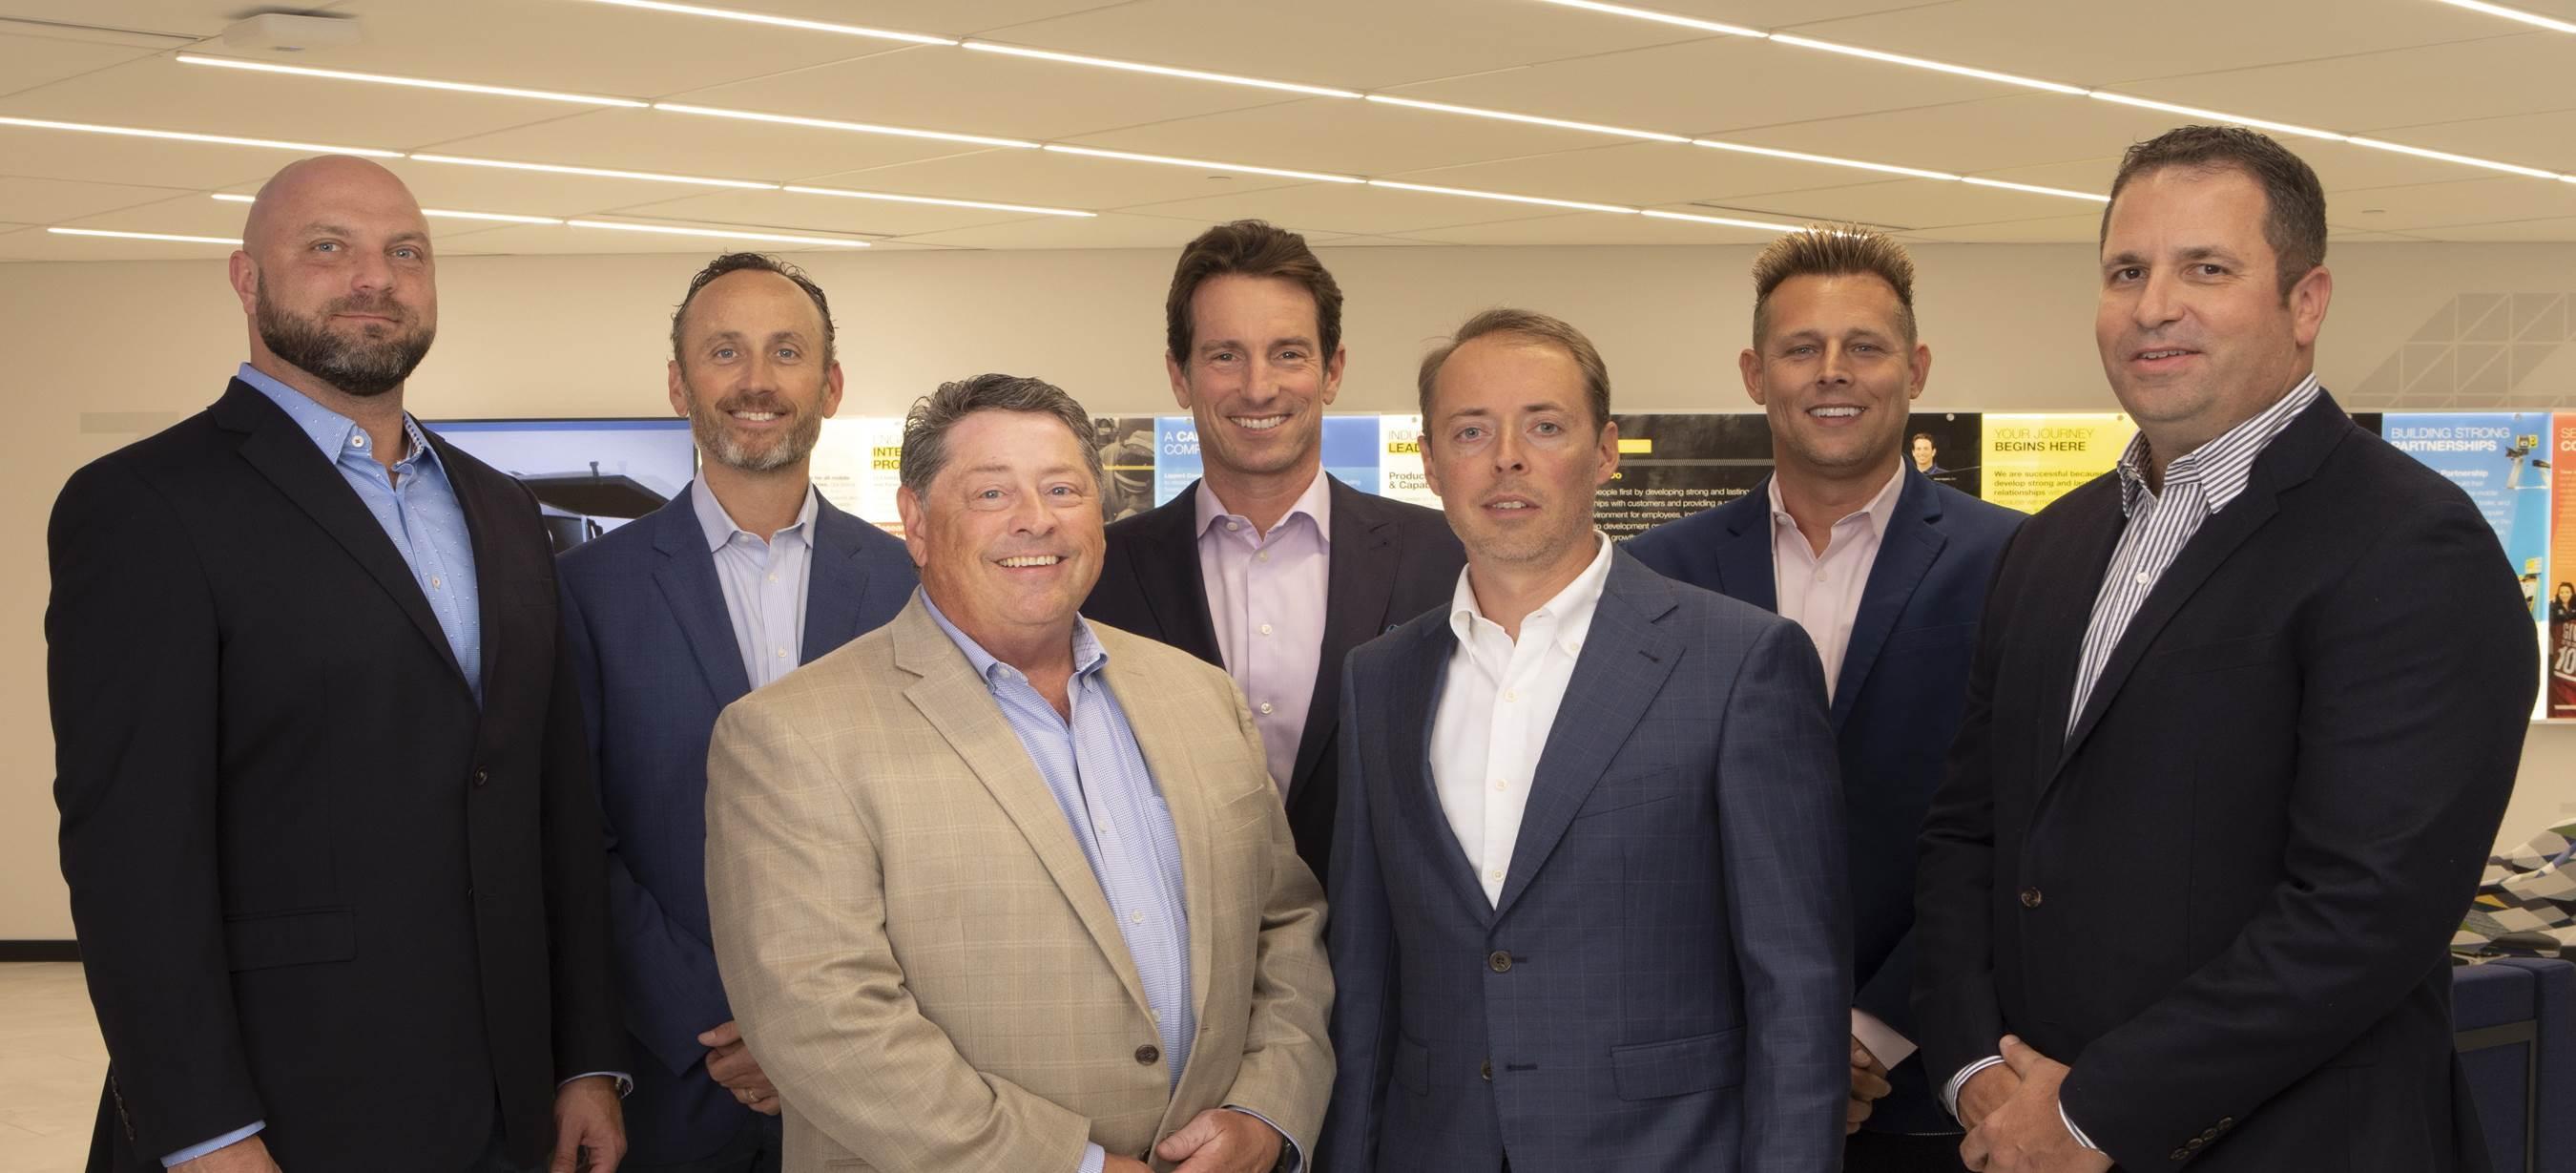 LCI Industries Leadership